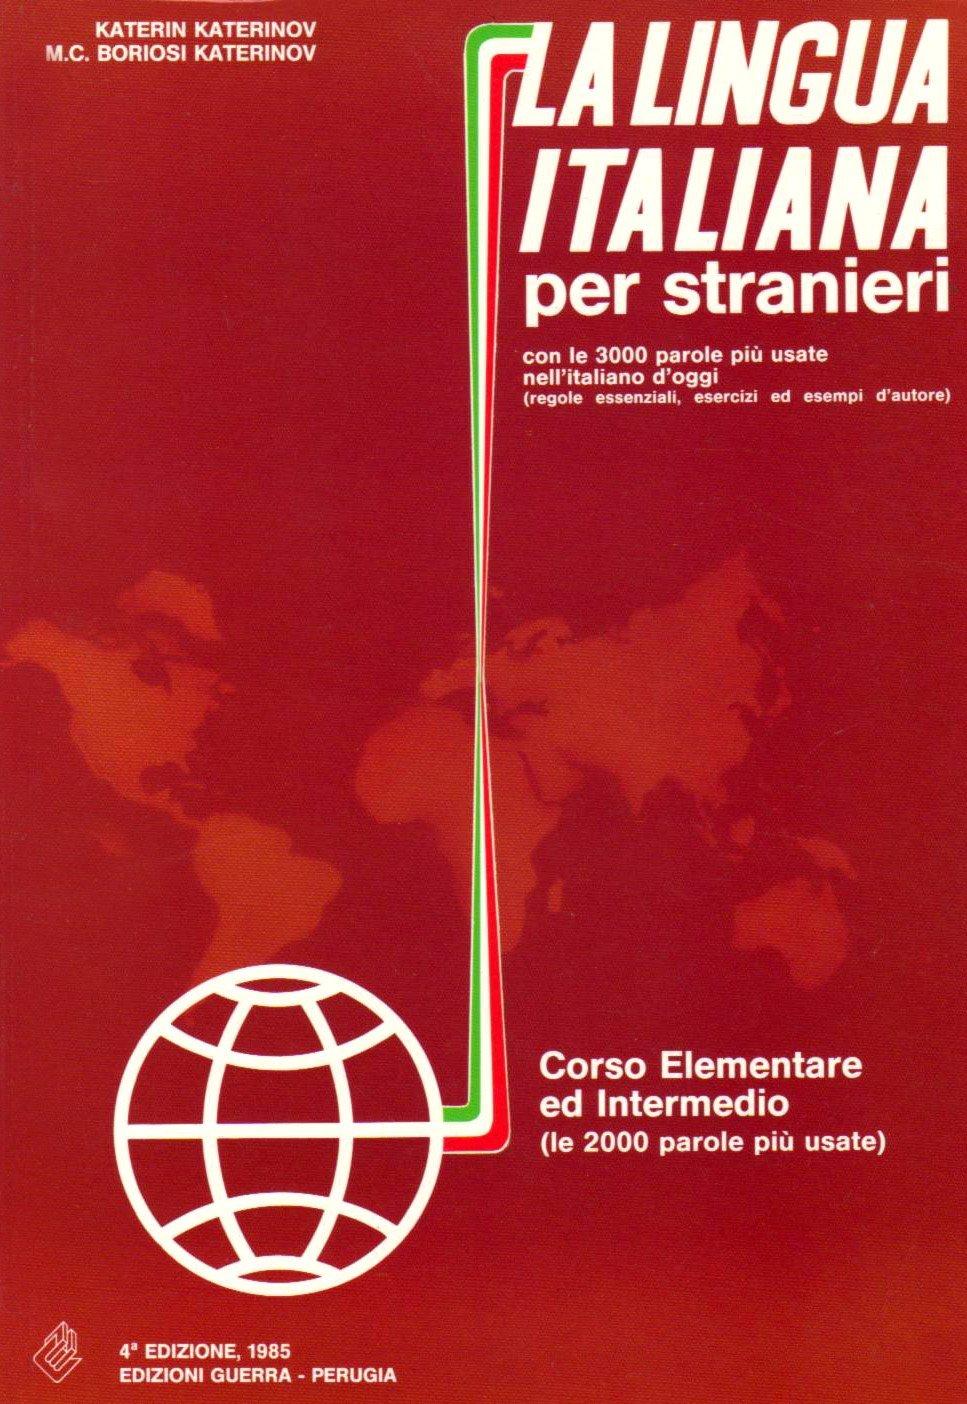 LA LINGUA ITALIANA PER STRANIERI. Corso Elementare ed Intermedio (A1-A2)<br>Учебник по италиански език